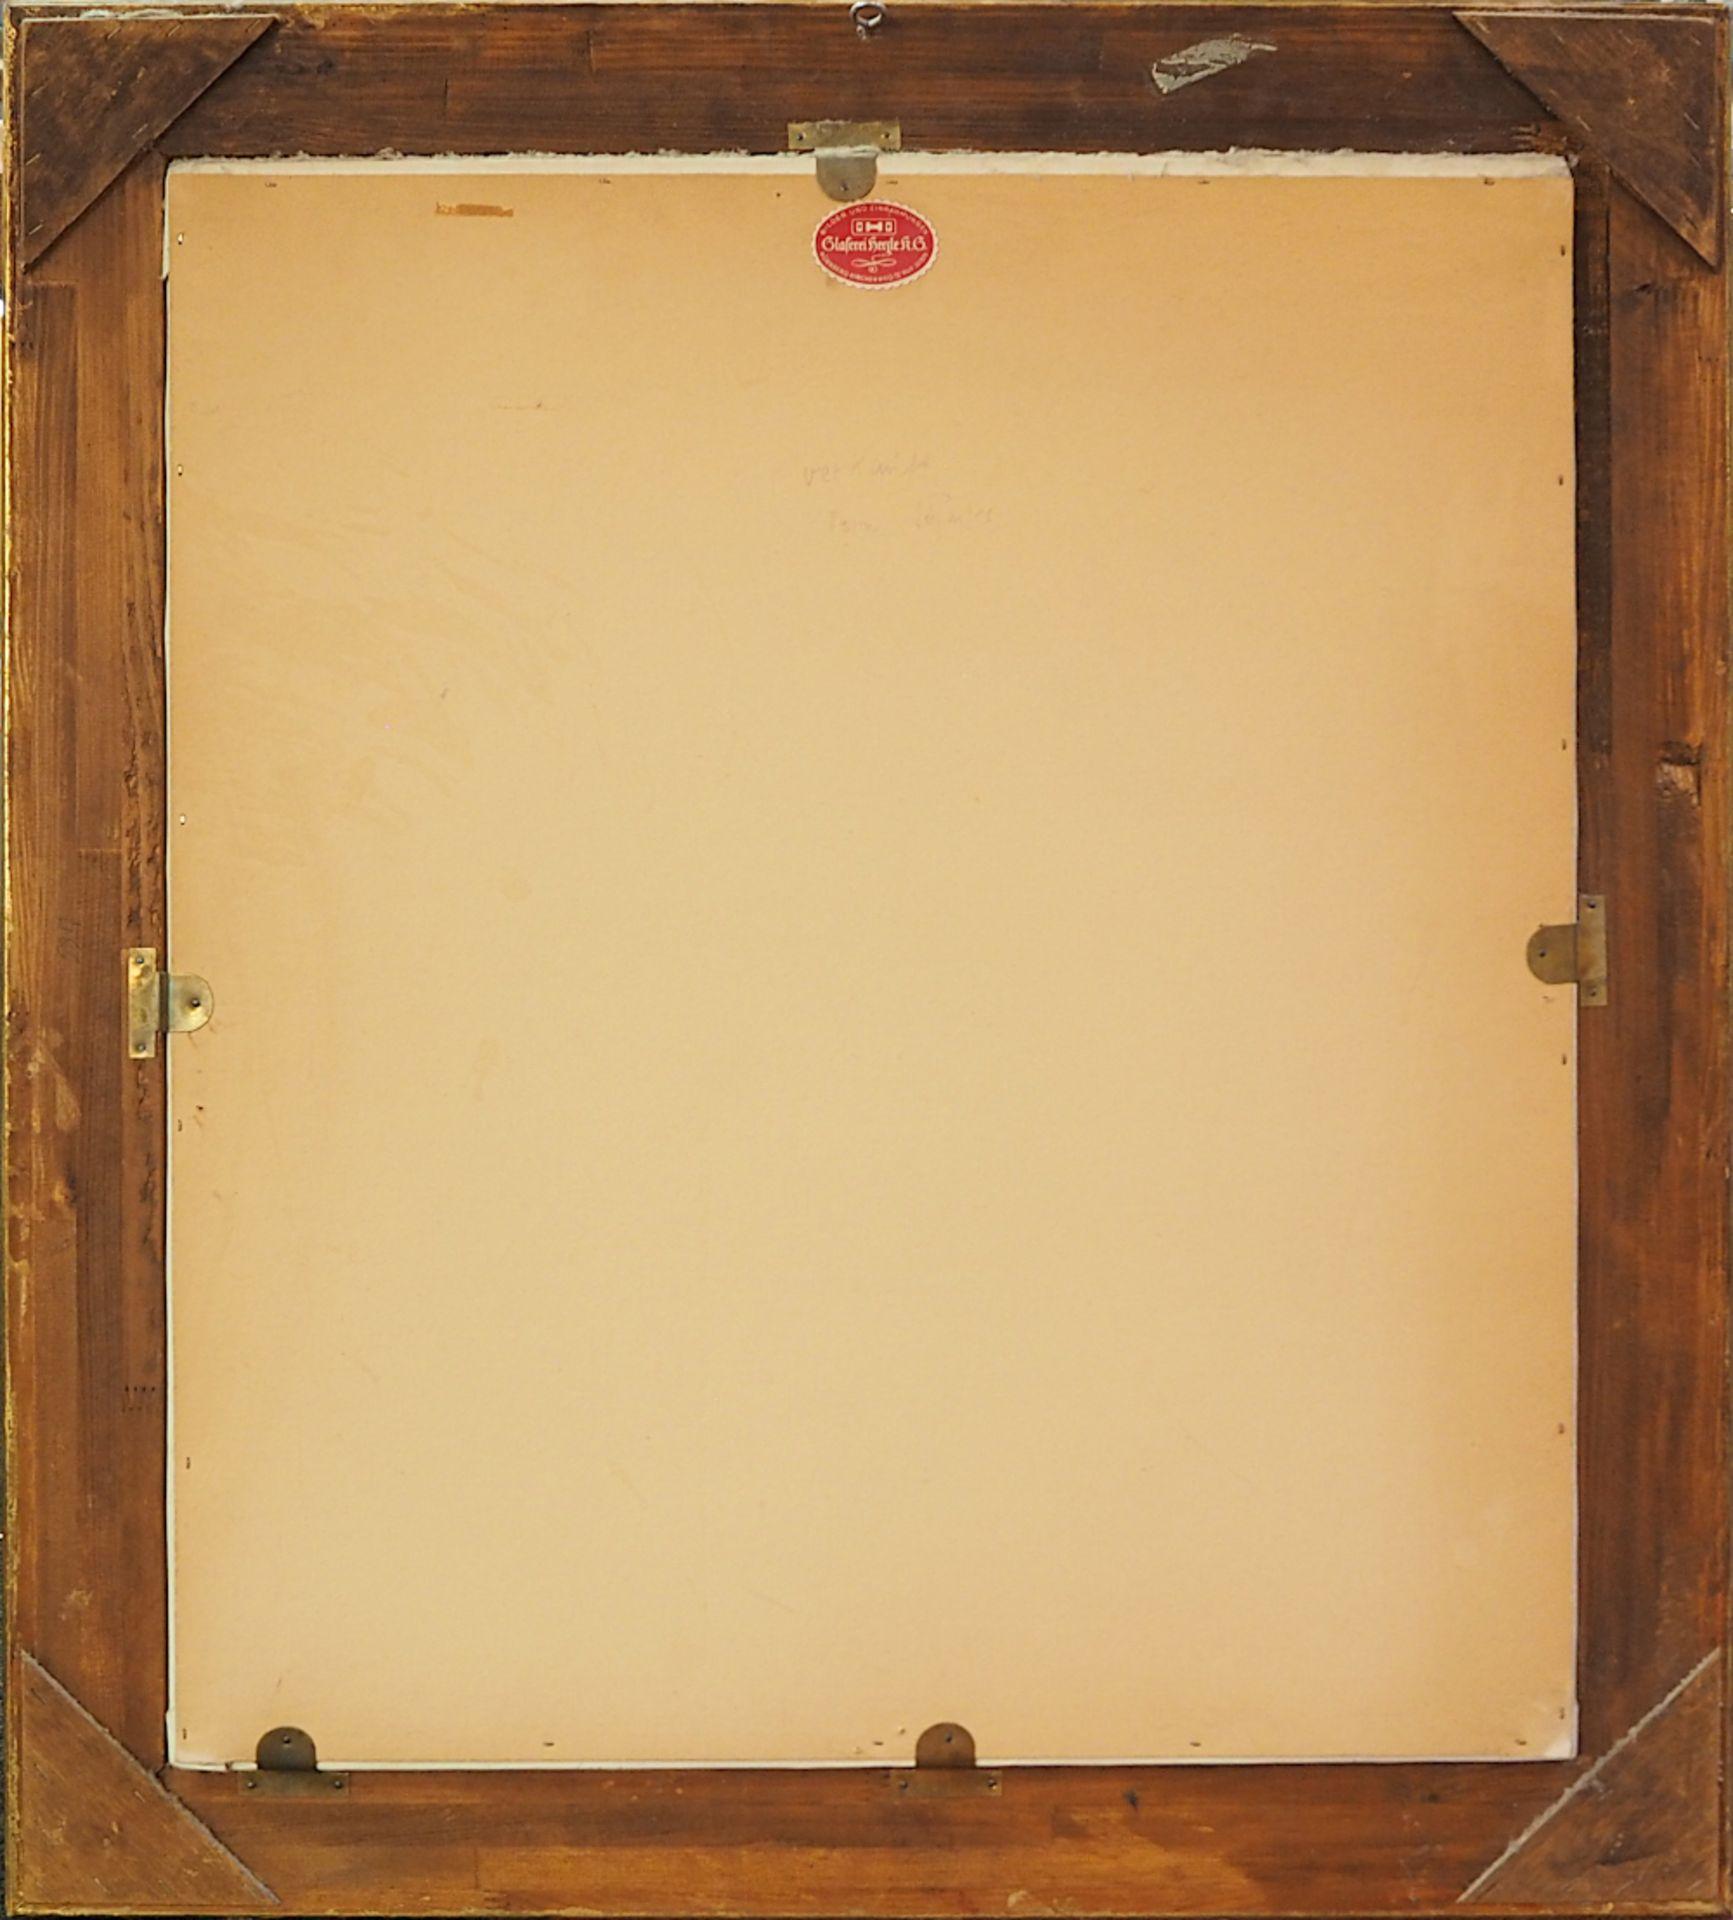 "1 Ölgemälde ""Ballerina im Spiegel"" R.u. sign. H. BREUNINGER (wohl Helmut B. *1921) Öl/Lwd., ca. - Bild 2 aus 4"